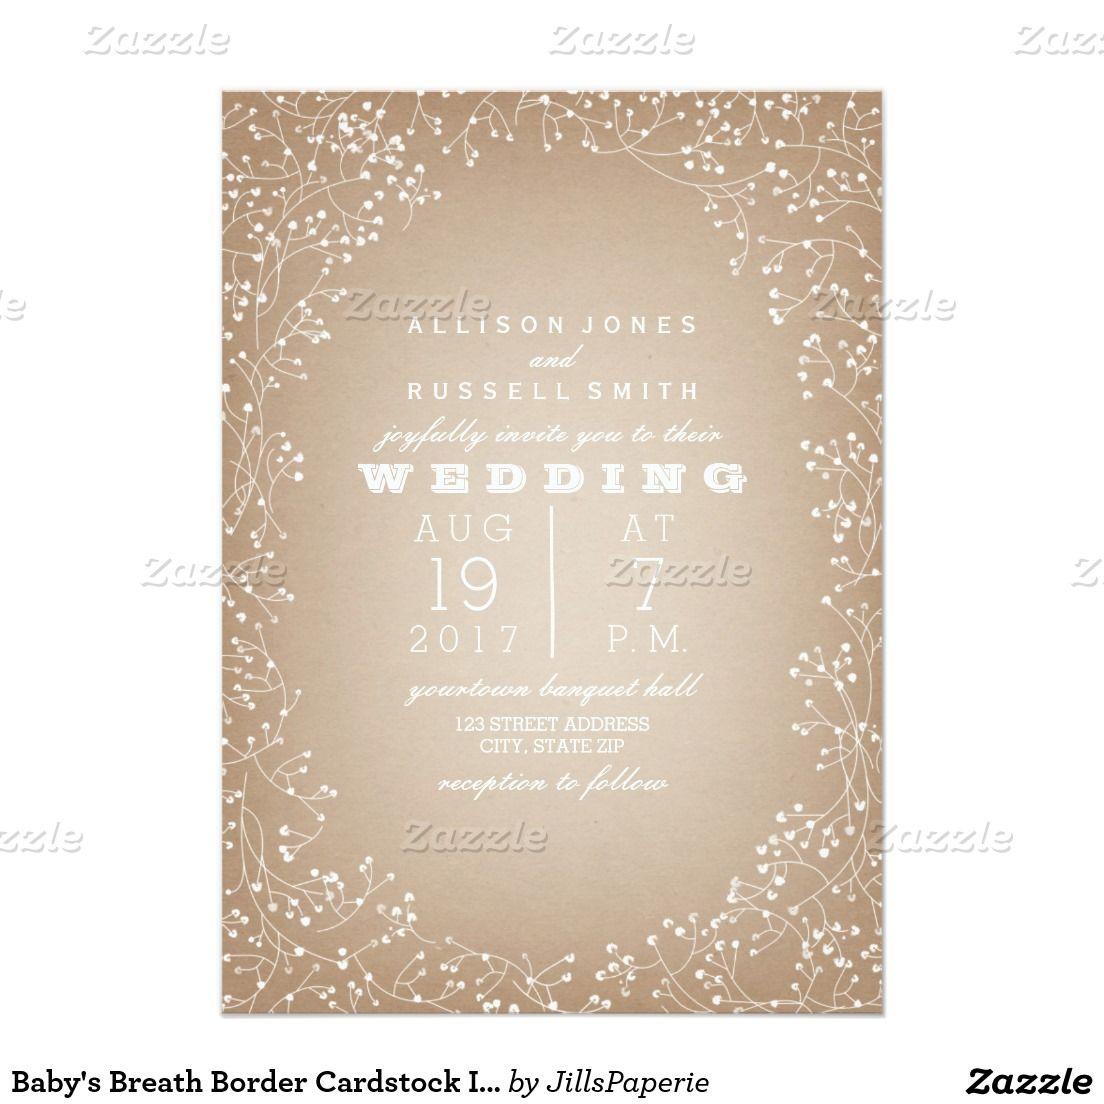 Baby S Breath Border Cardstock Inspired Invitation Zazzle Com Wedding Invitation Paper Invitations Floral Wedding Invitations